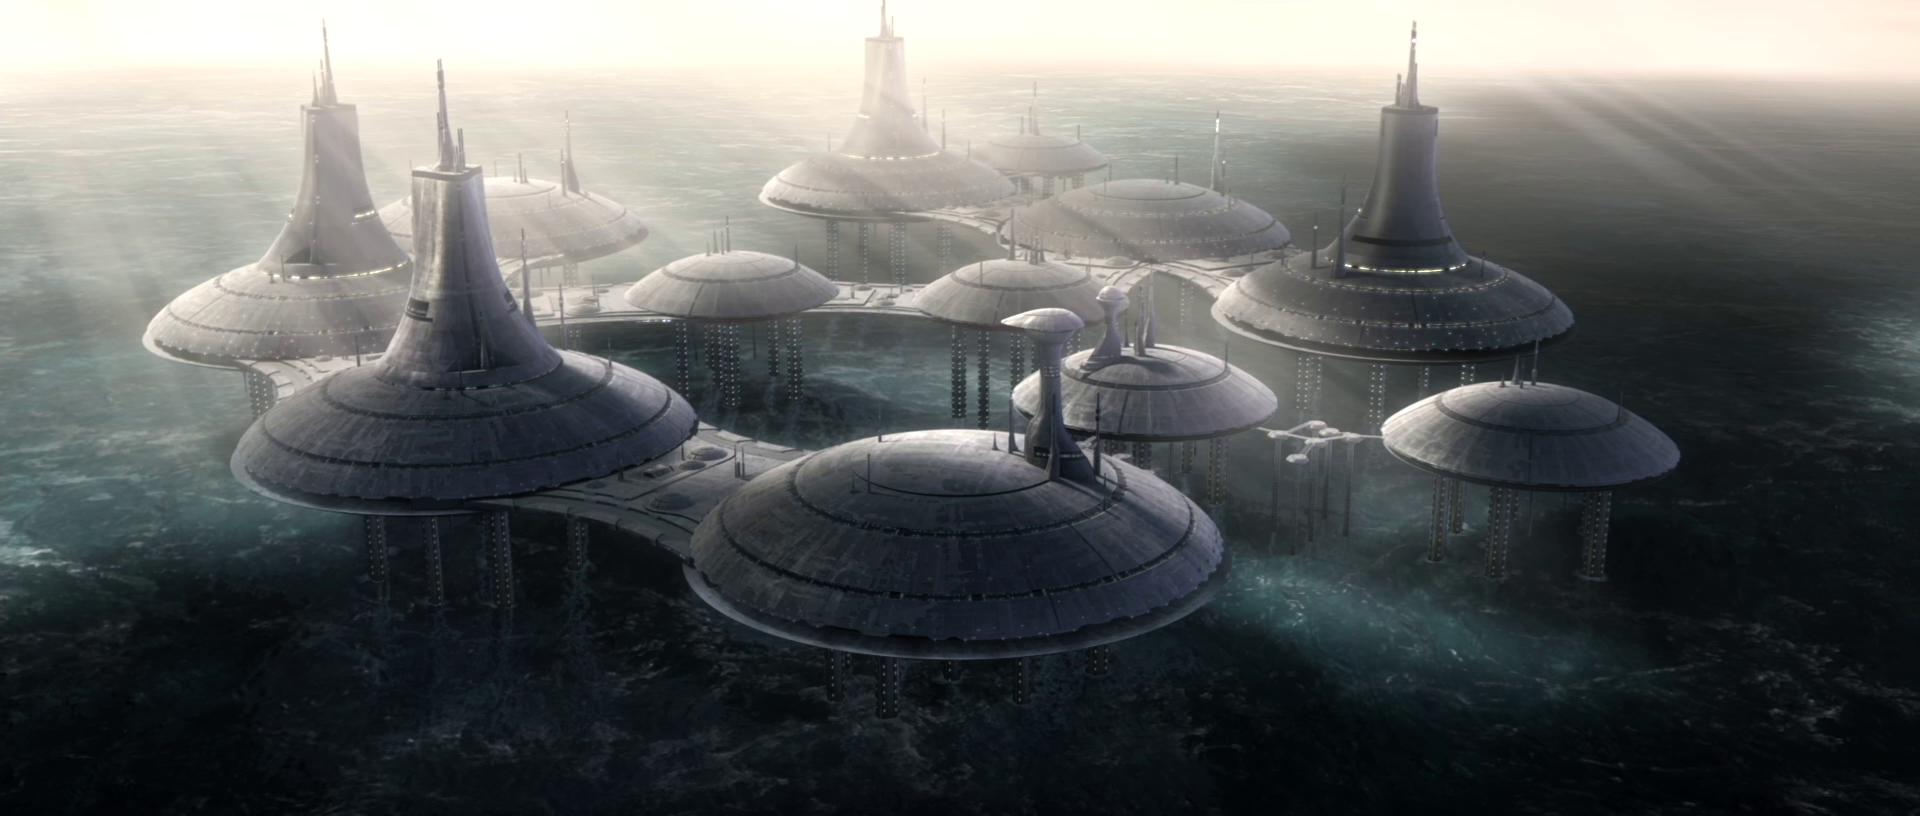 Tipoca City | Wookieepedia | FANDOM powered by Wikia on guardians of the galaxy home planet, yoda home planet, luke skywalker home planet,